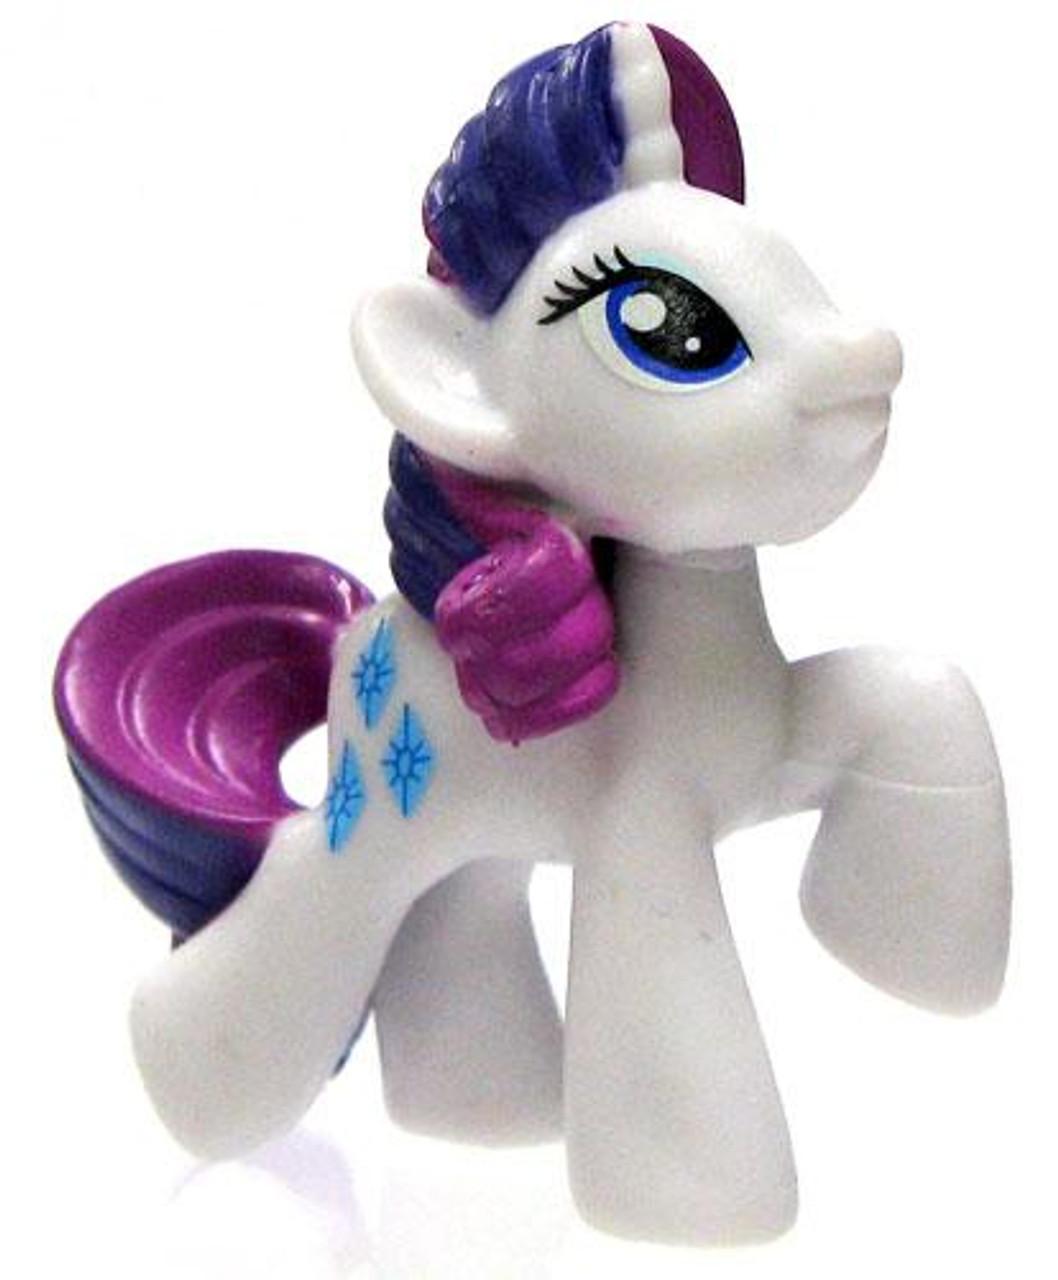 My Little Pony Friendship is Magic 2 Inch Series 5 Rarity PVC Figure